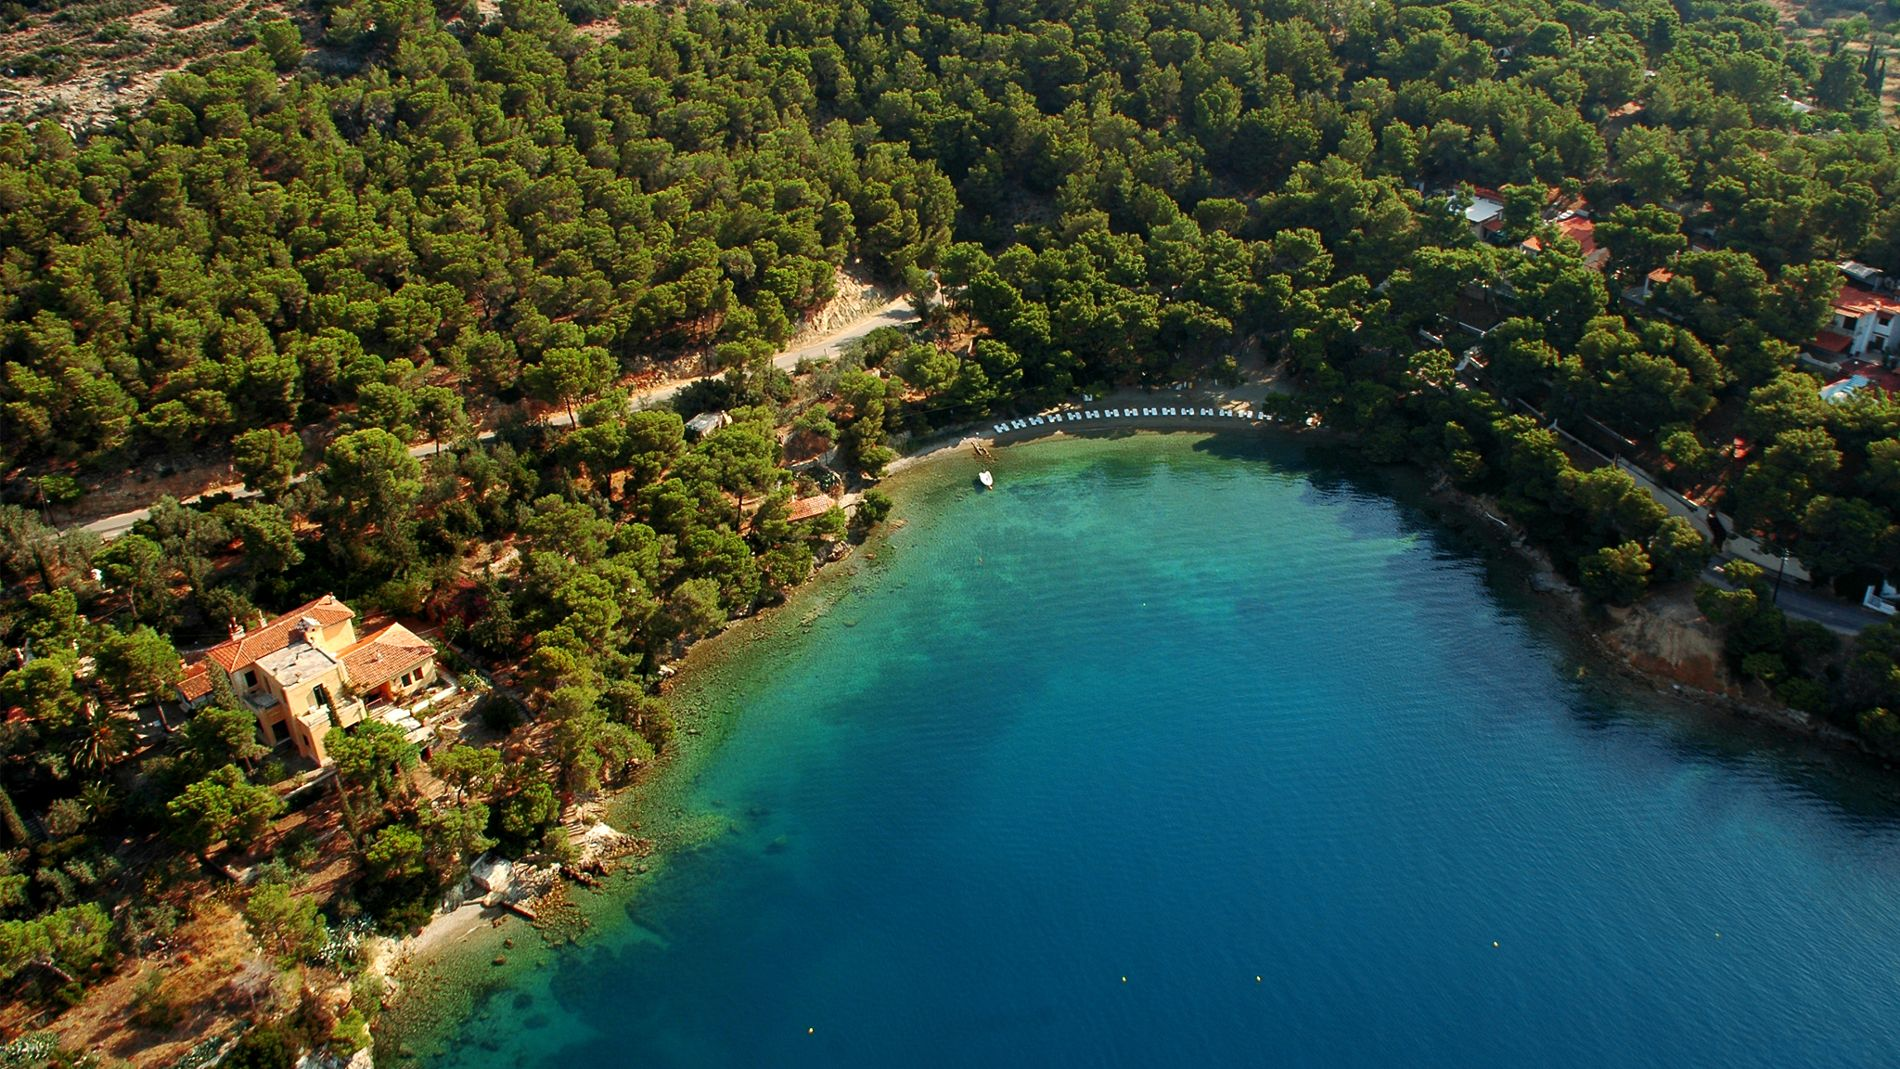 Limanaki tis Agapis beach from above in Poros island, Greece. Source: Top Greek Islands